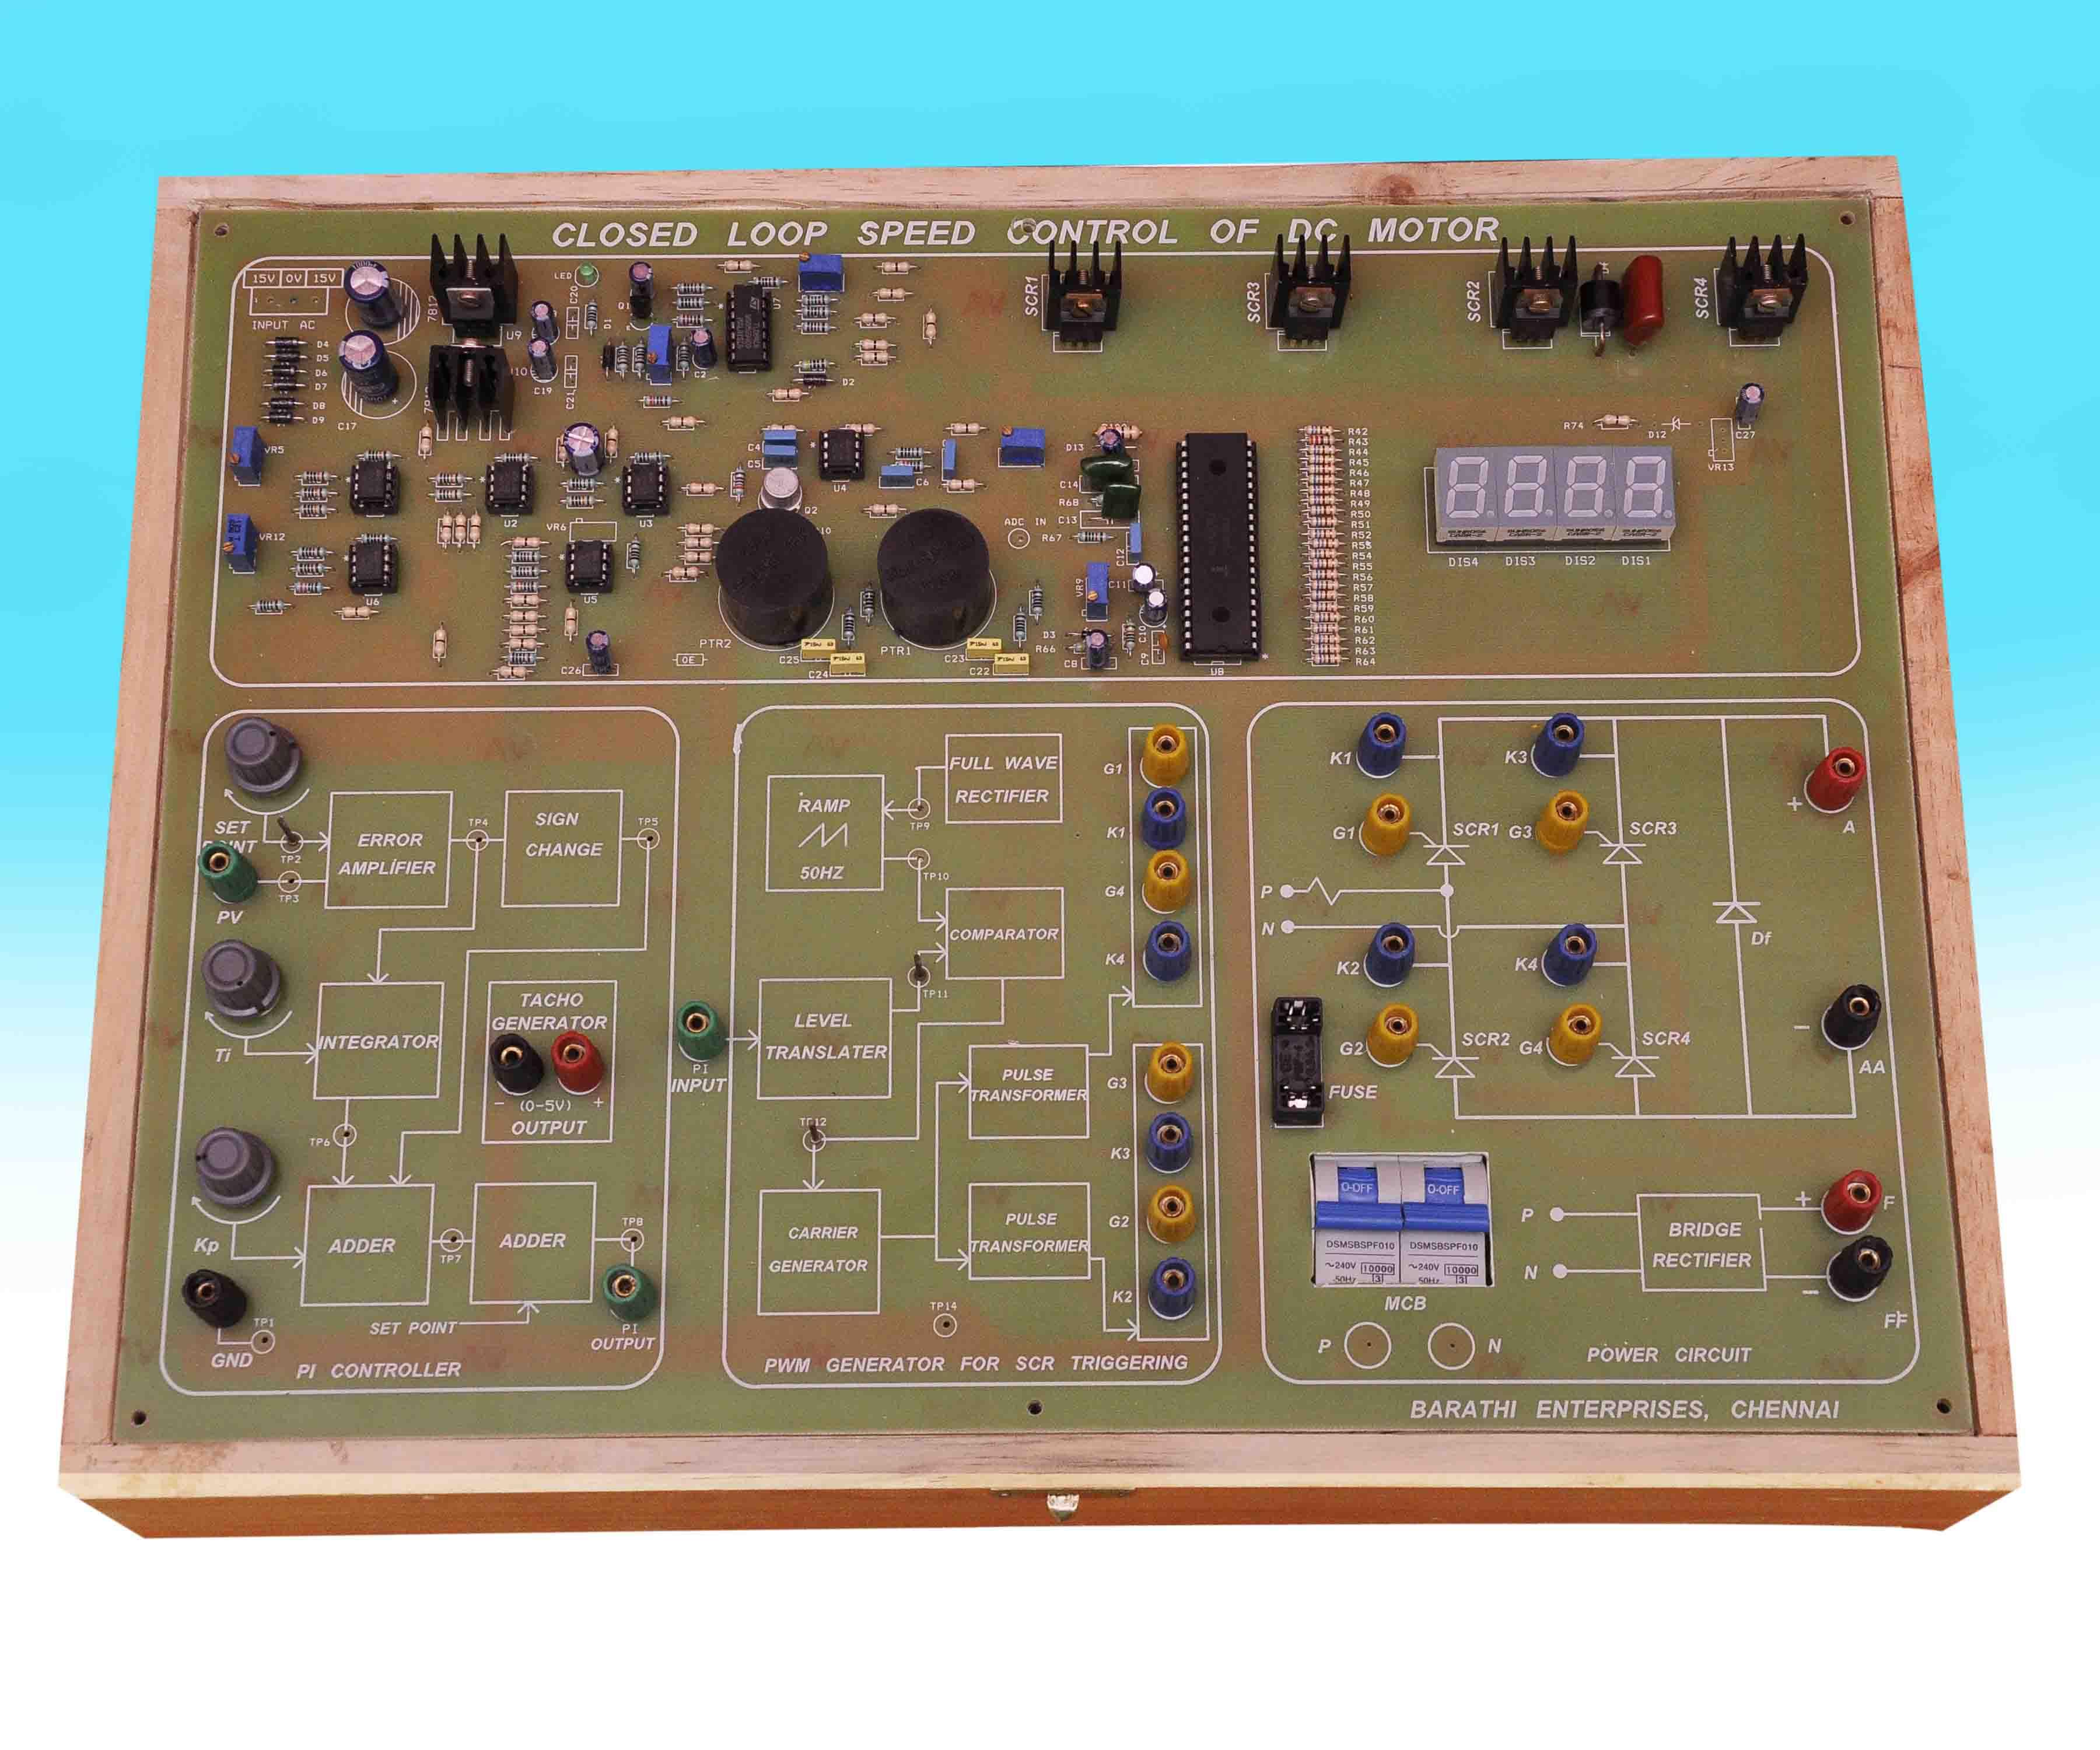 Barathi Enterprises Universal Motor Speed Control Circuit Objective